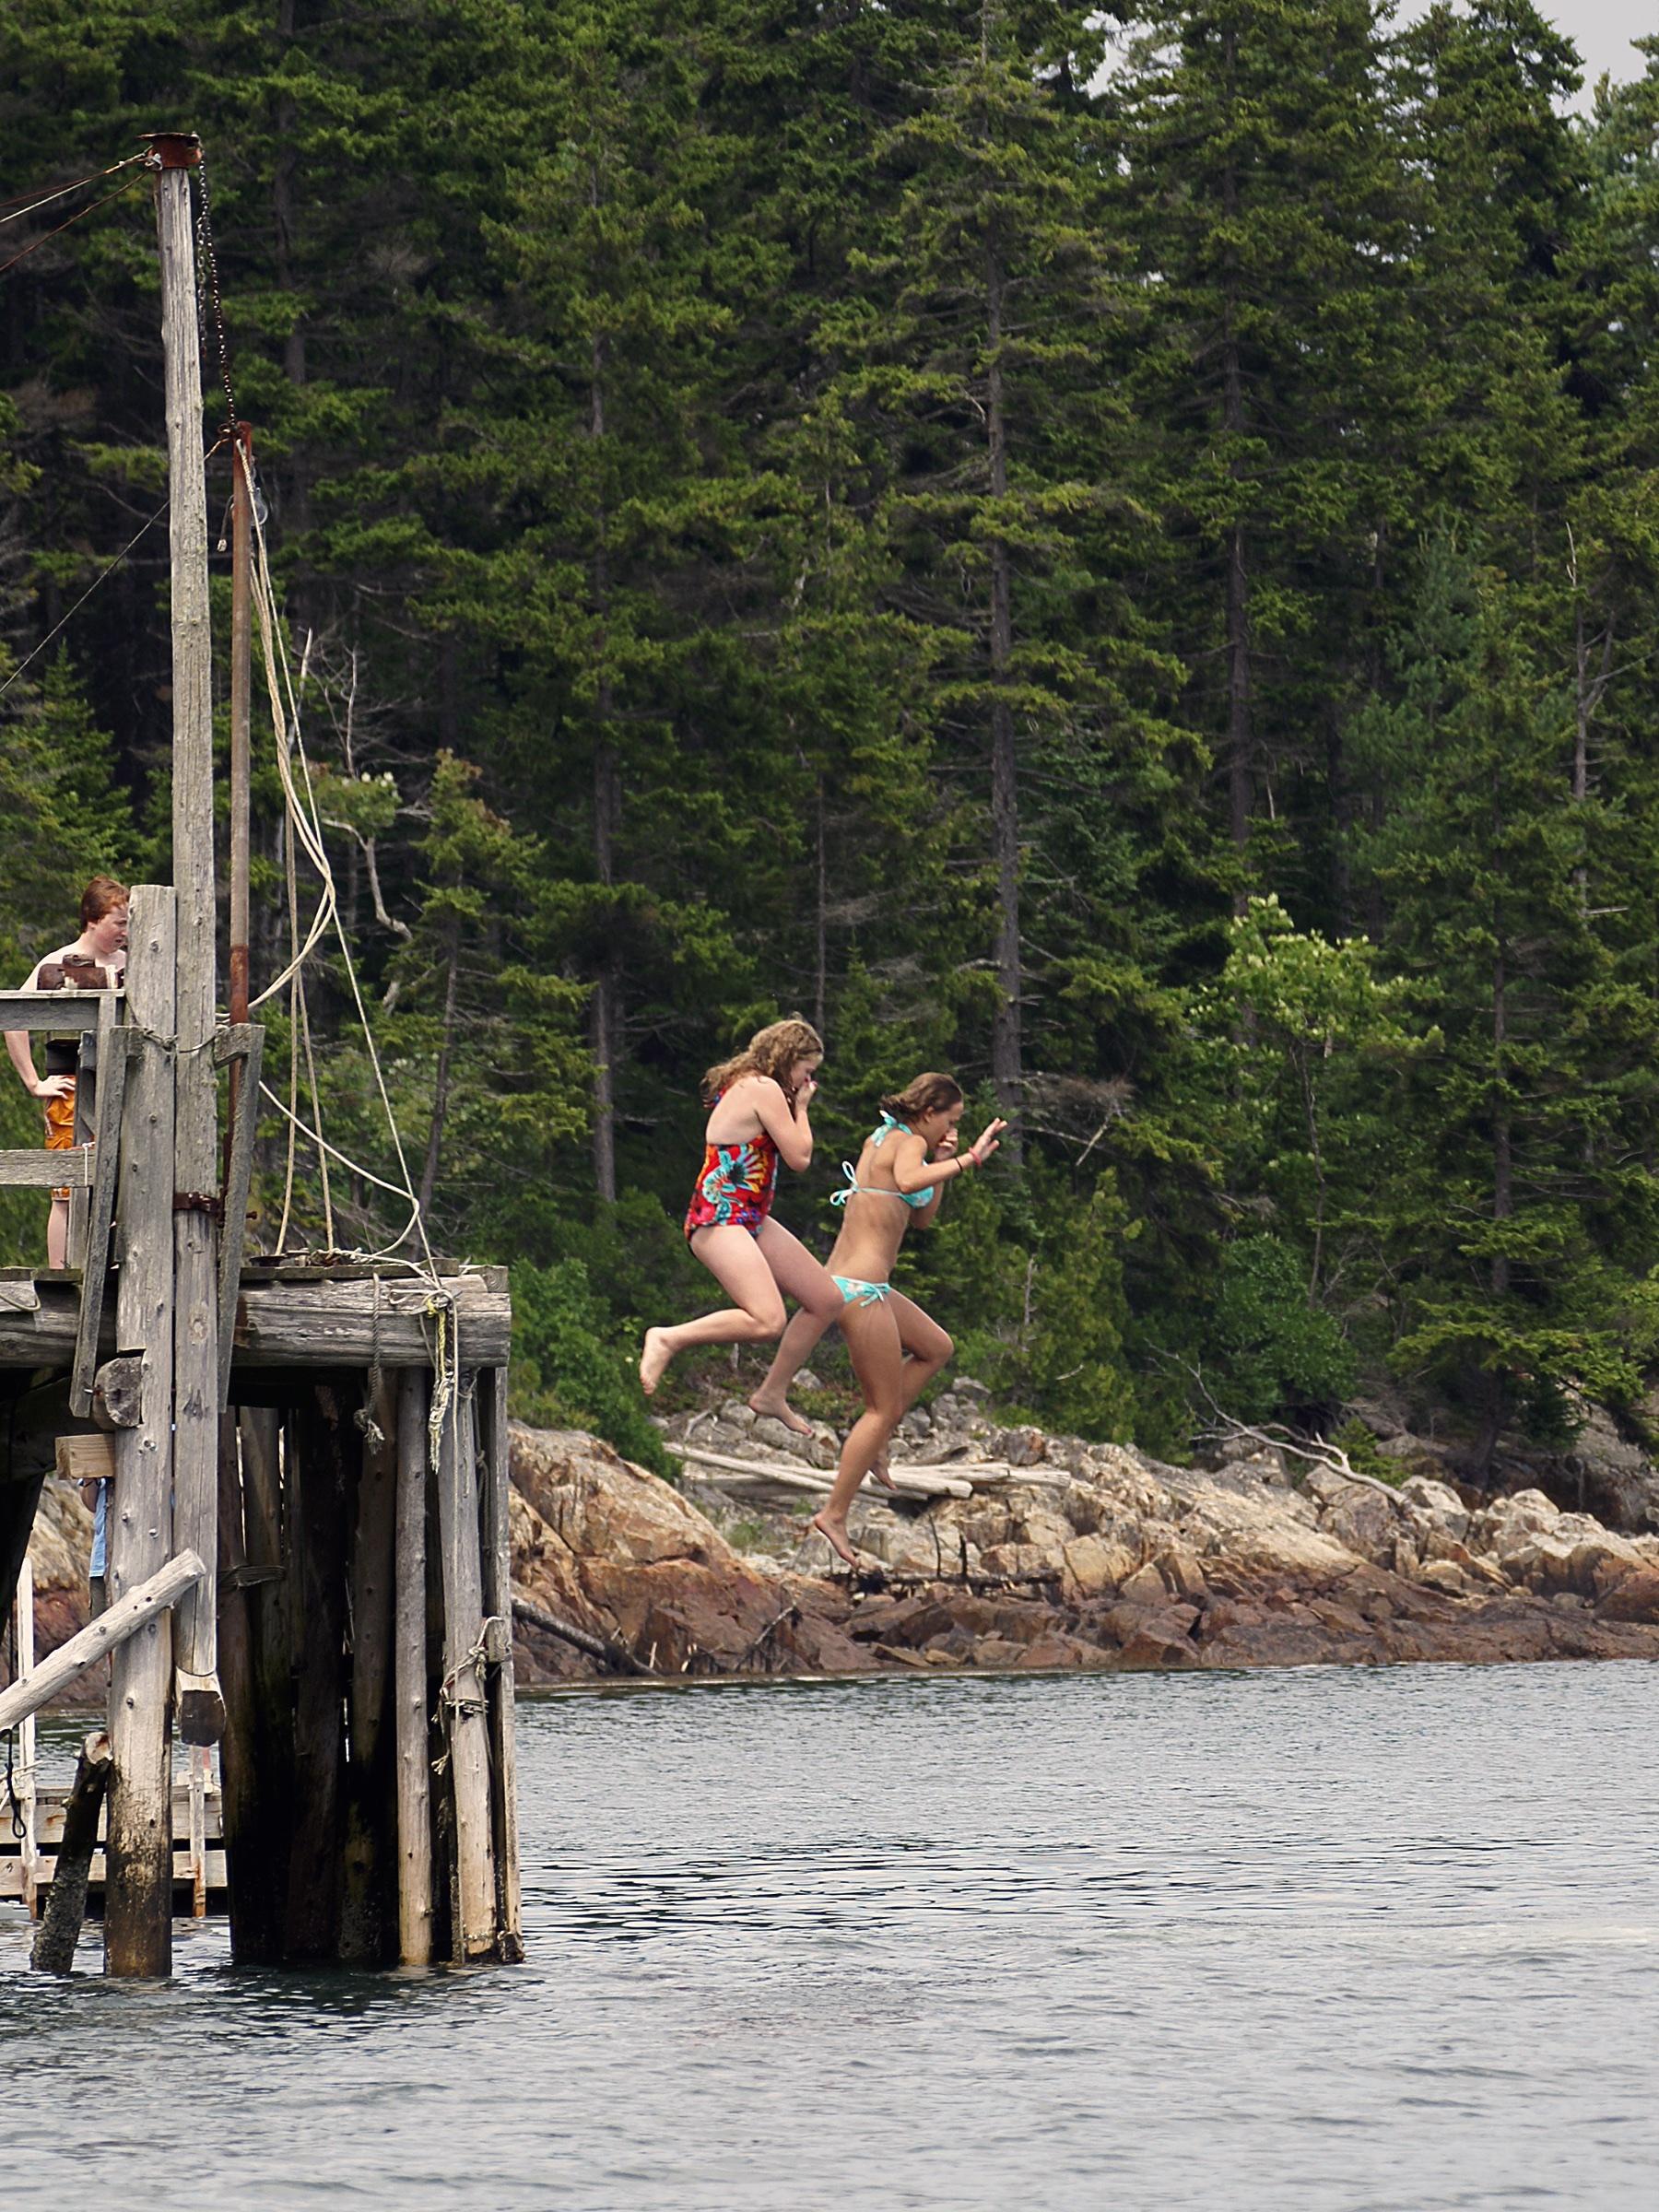 Hiram Blake Camp, Harborside, Maine   The plunge